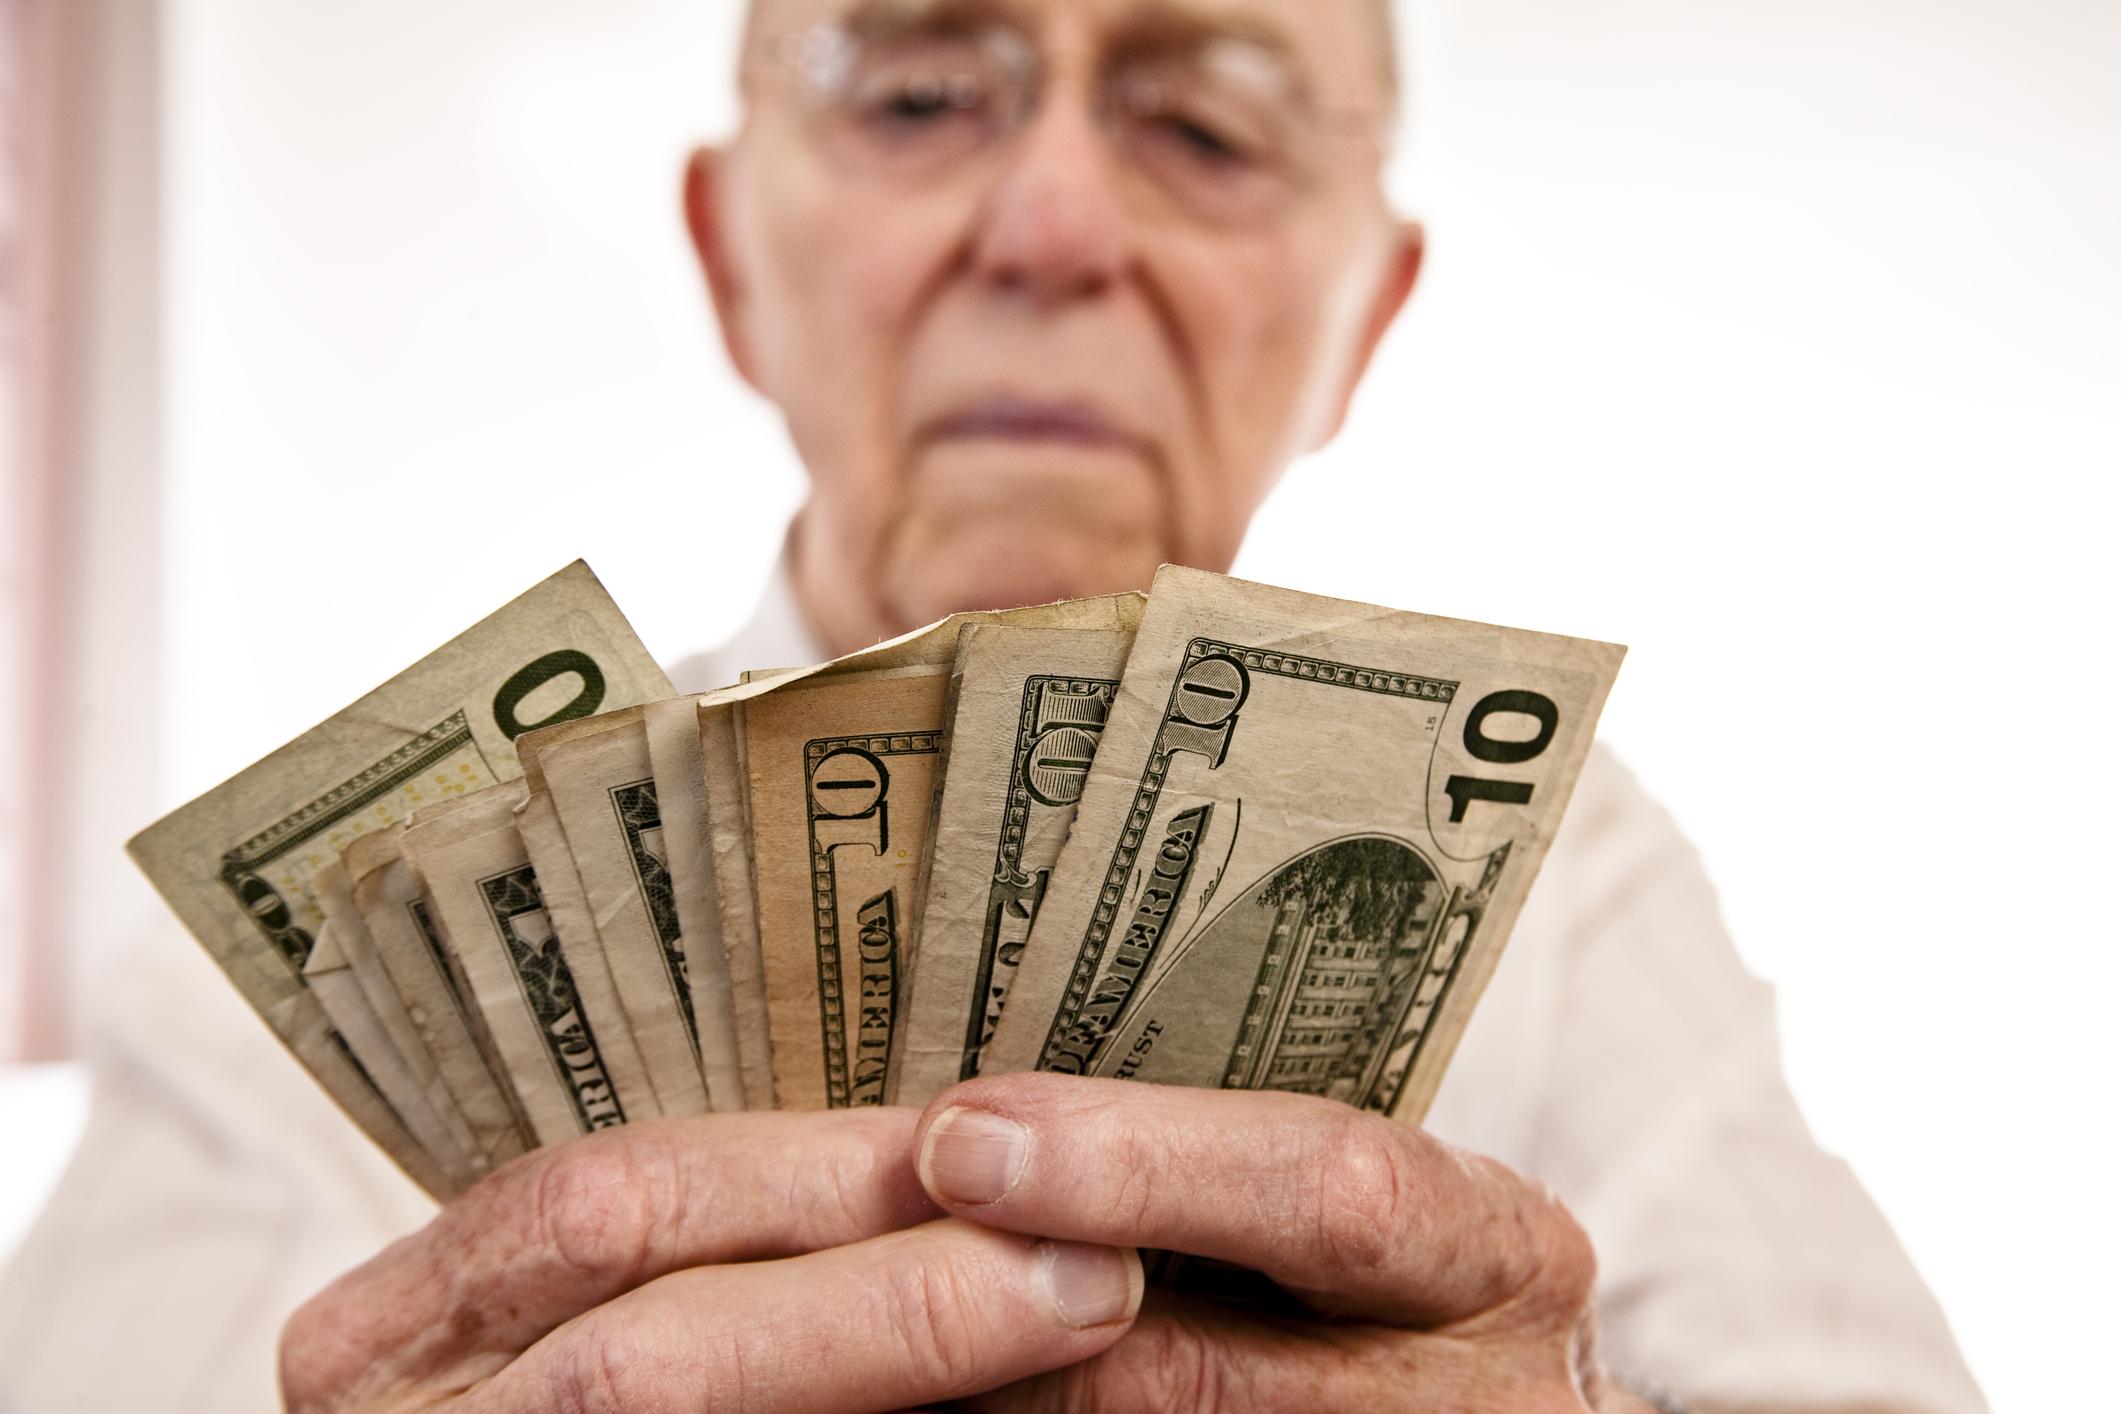 A senior citizen counting his Social Security income.